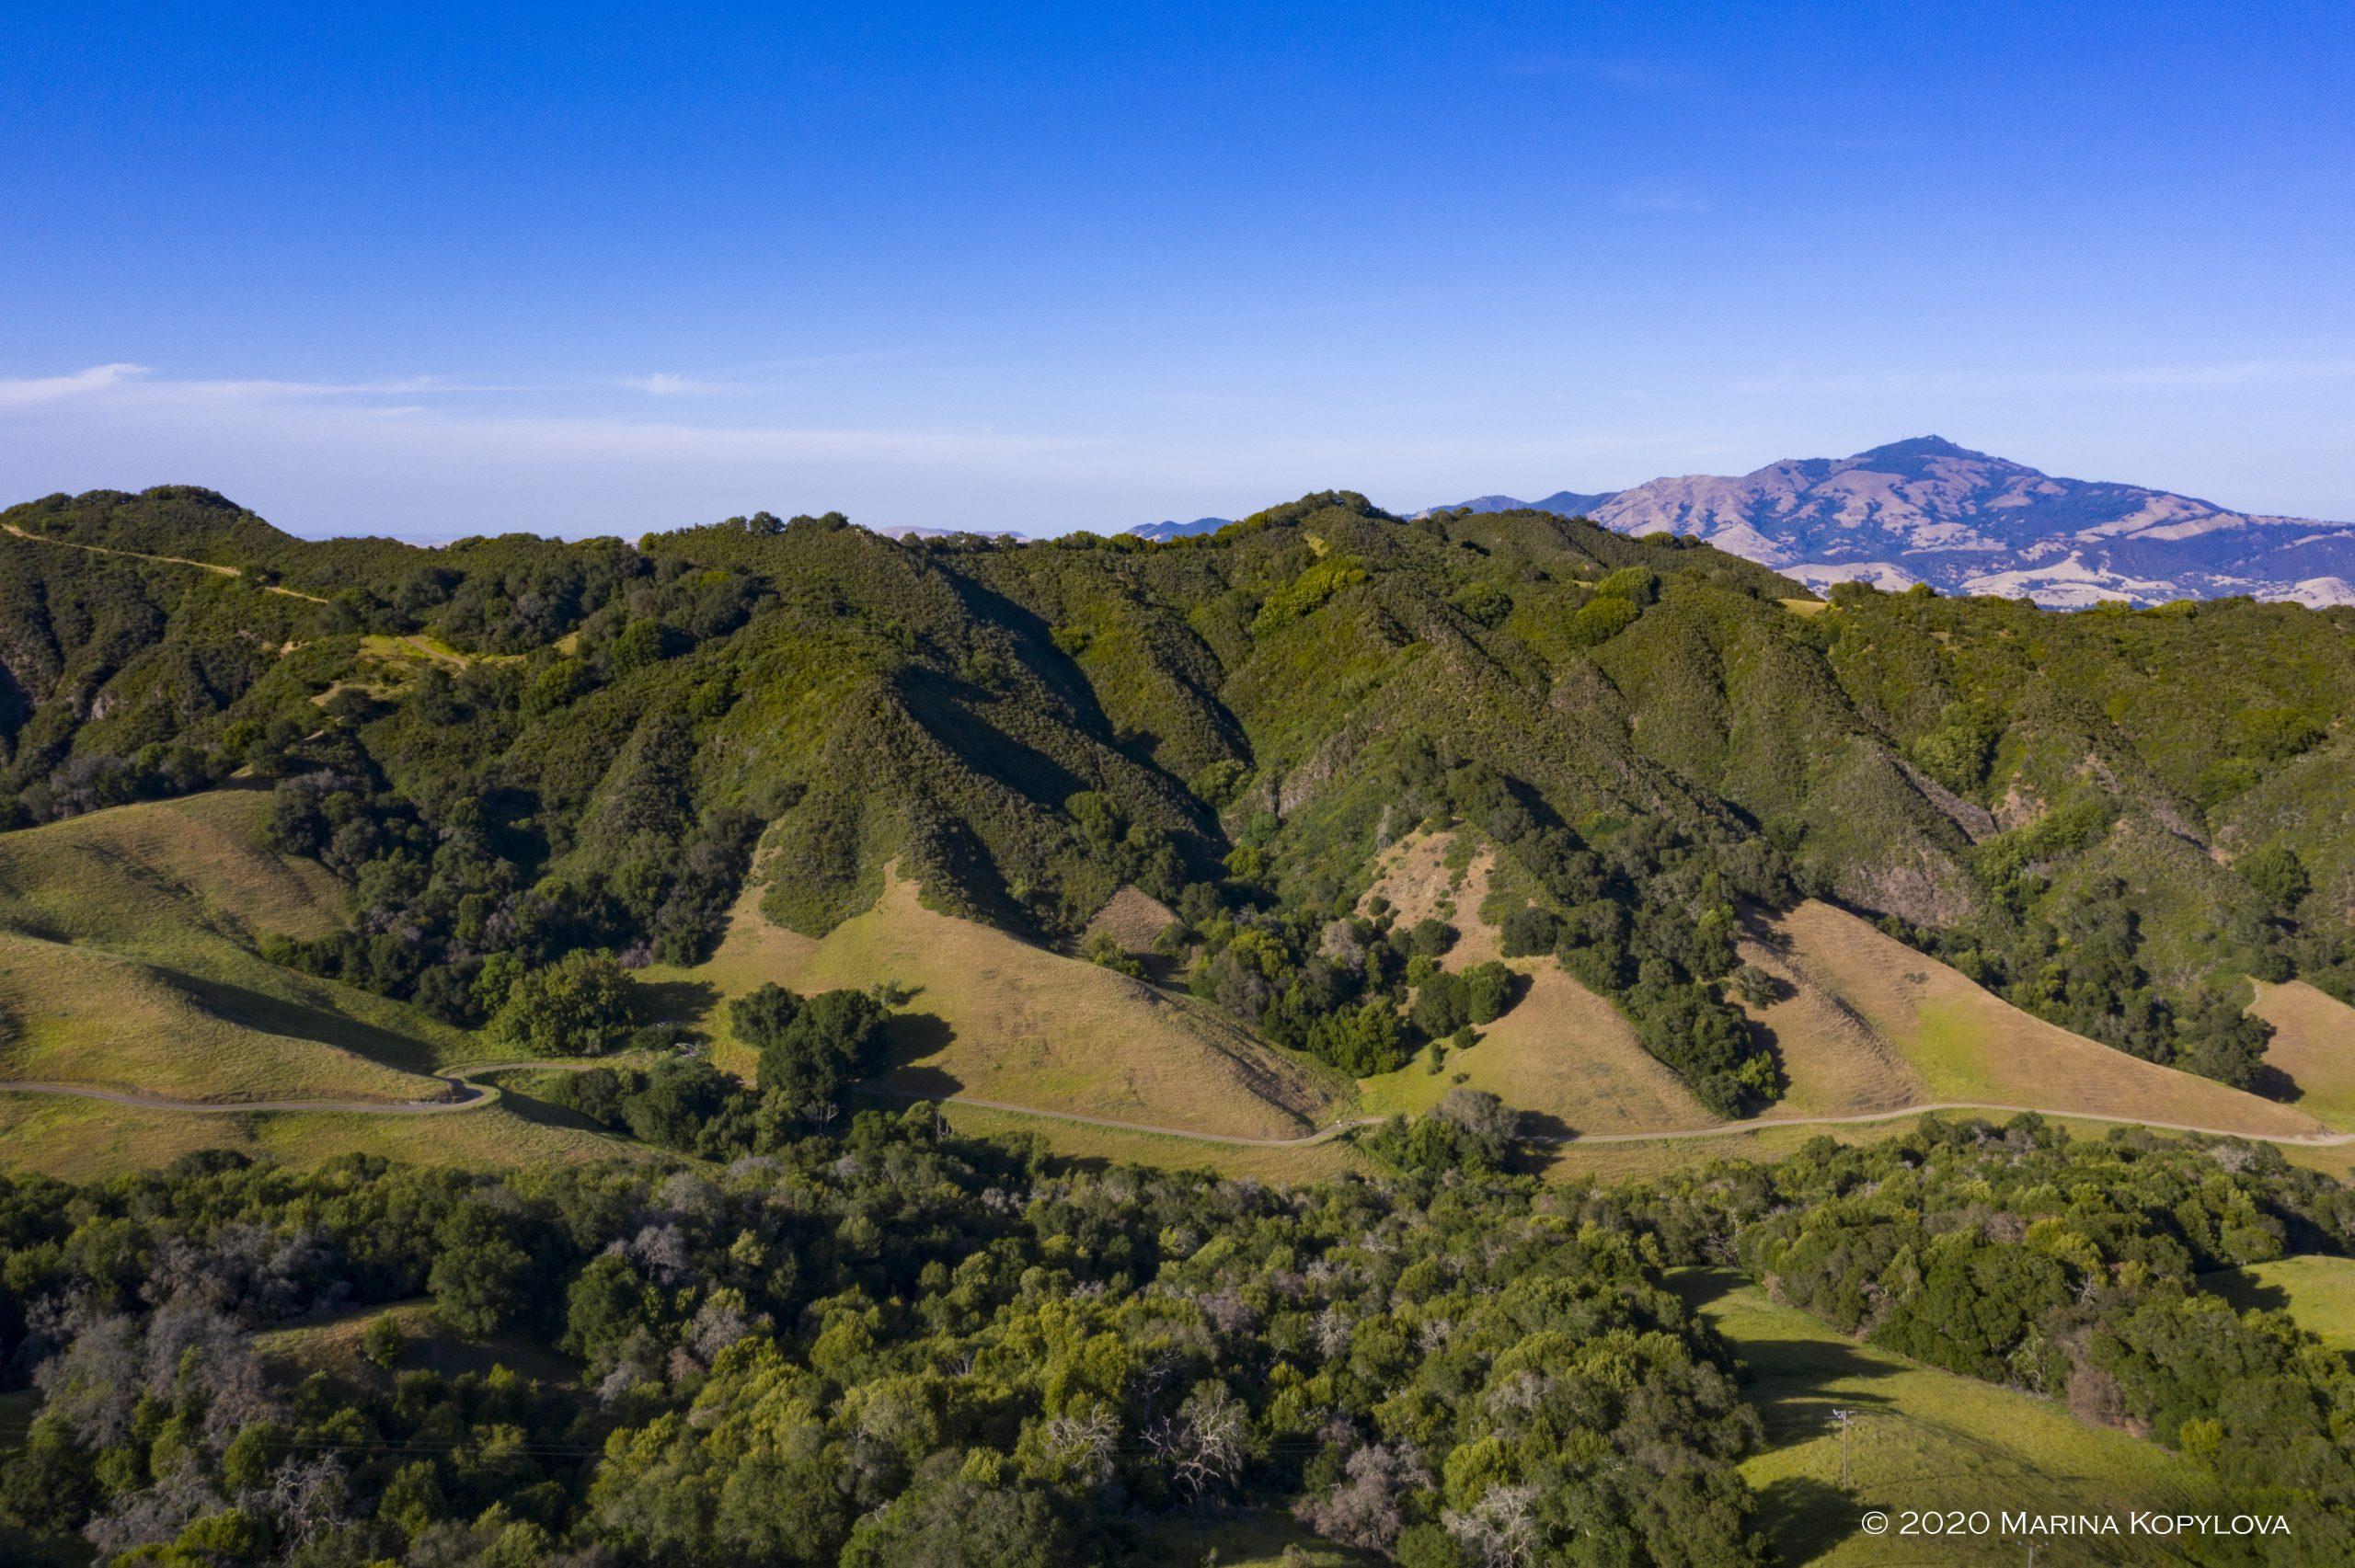 Las Trampas Park San Ramon, California - Spring 2020 - Marina Kopylova